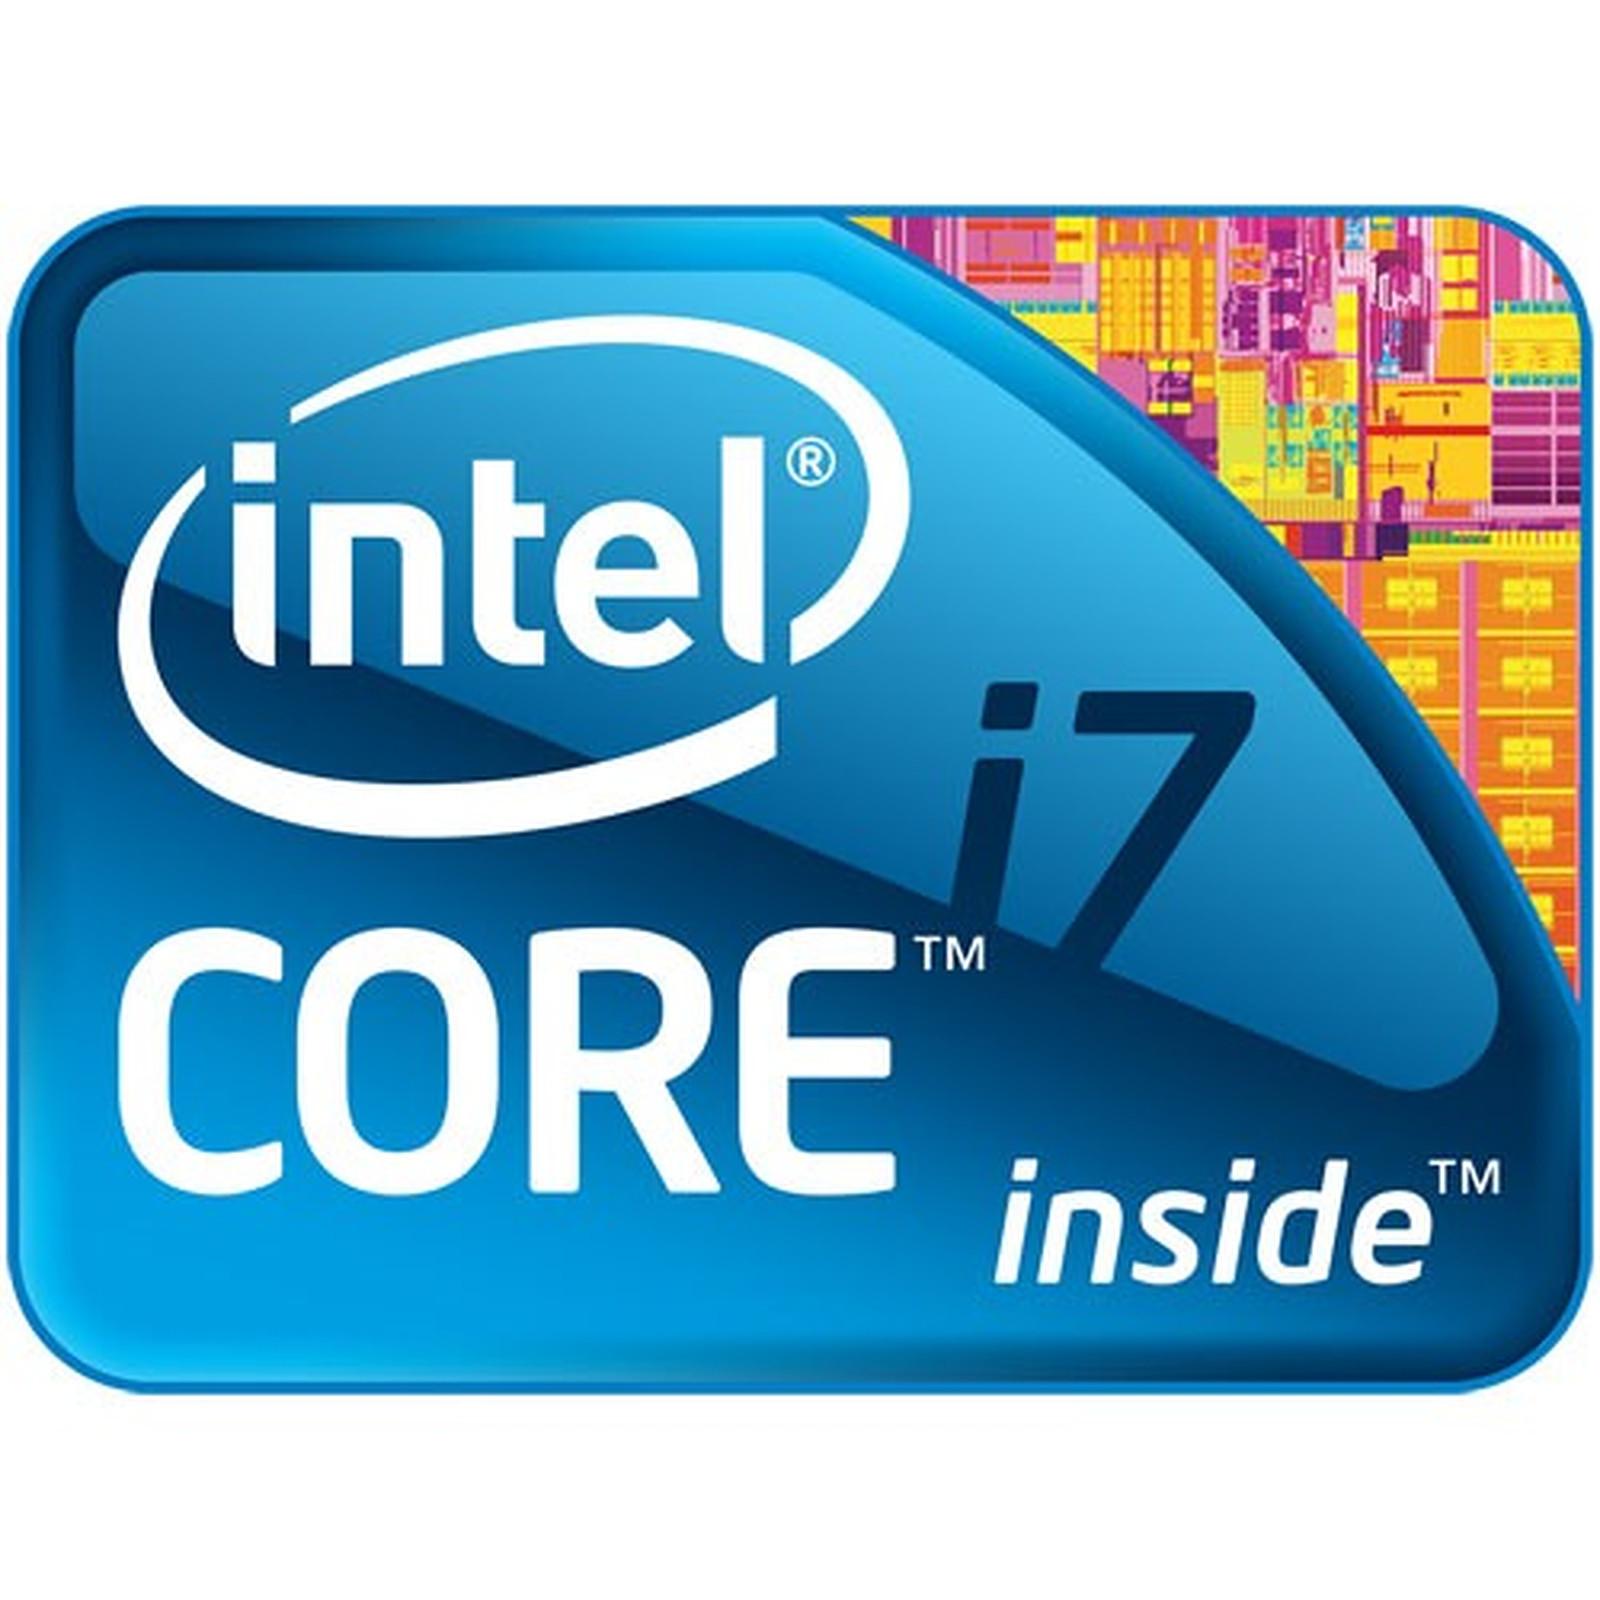 Intel Core i7-740QM (1.73 GHz)